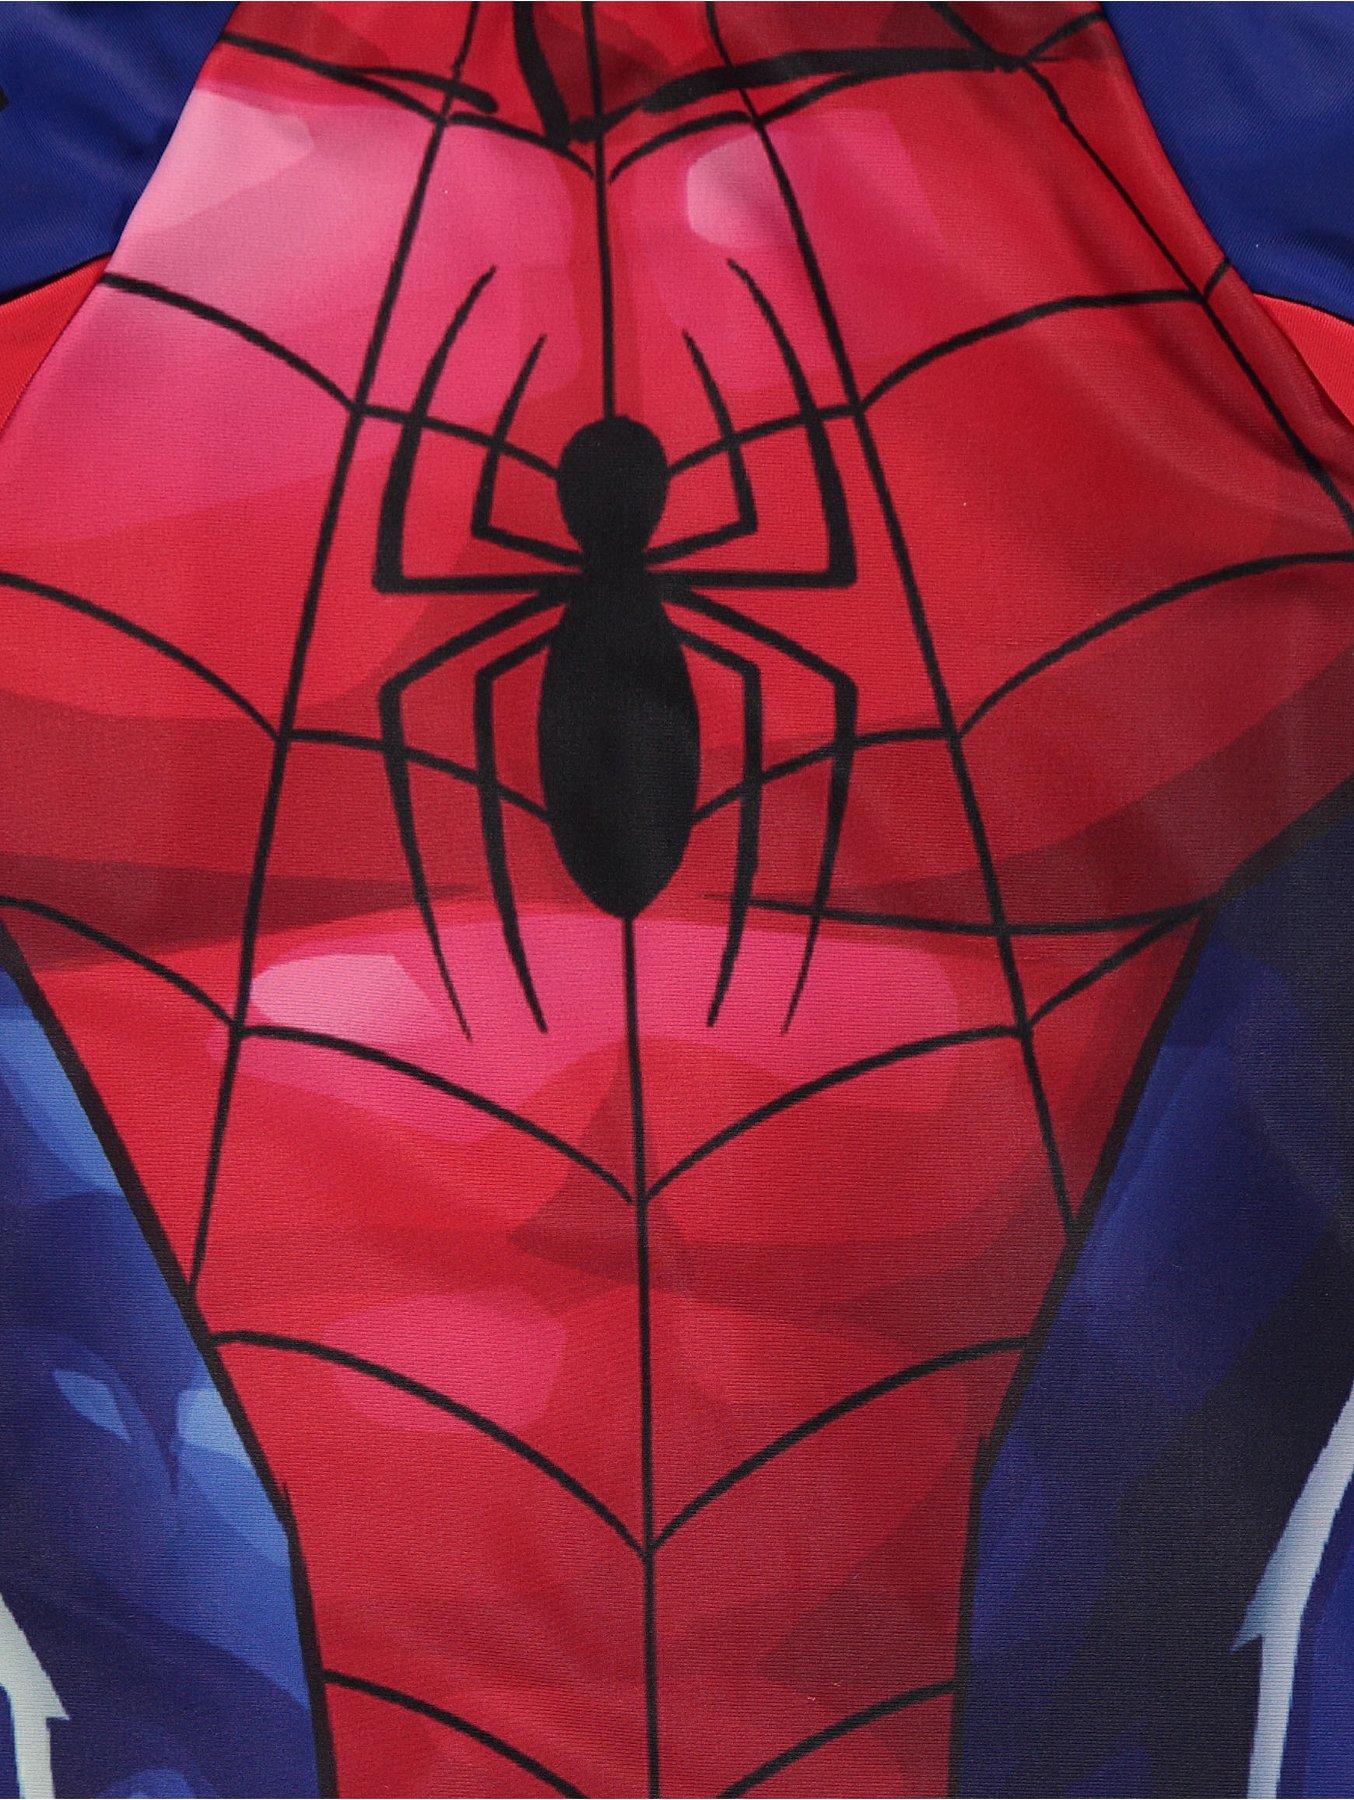 3abebb76ea5 Marvel Spider-Man Sun Protection Swimsuit and Hat Set   Kids   George